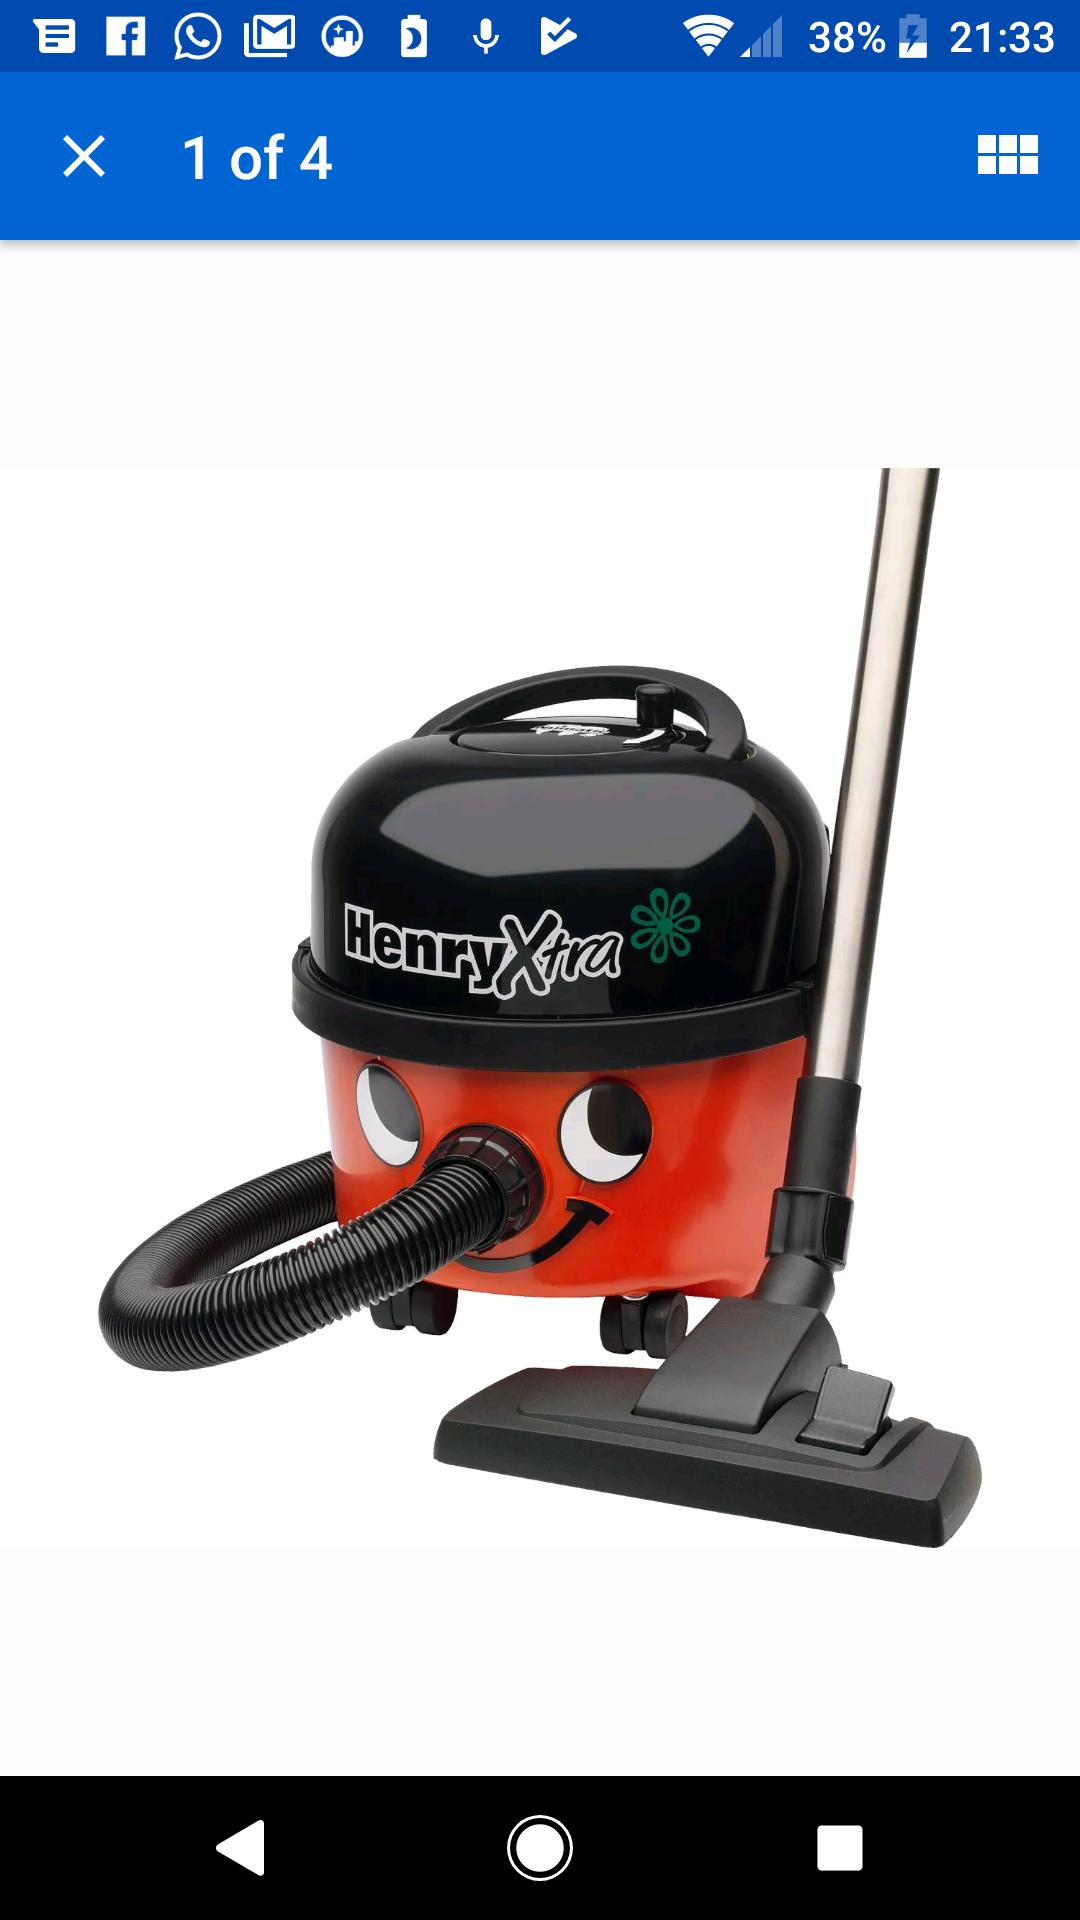 Numatic Henry Xtra HVX20011 Bagged Multi Floor Cylinder Vacuum Cleaner in Red £119.99 @ CoOp Ebay